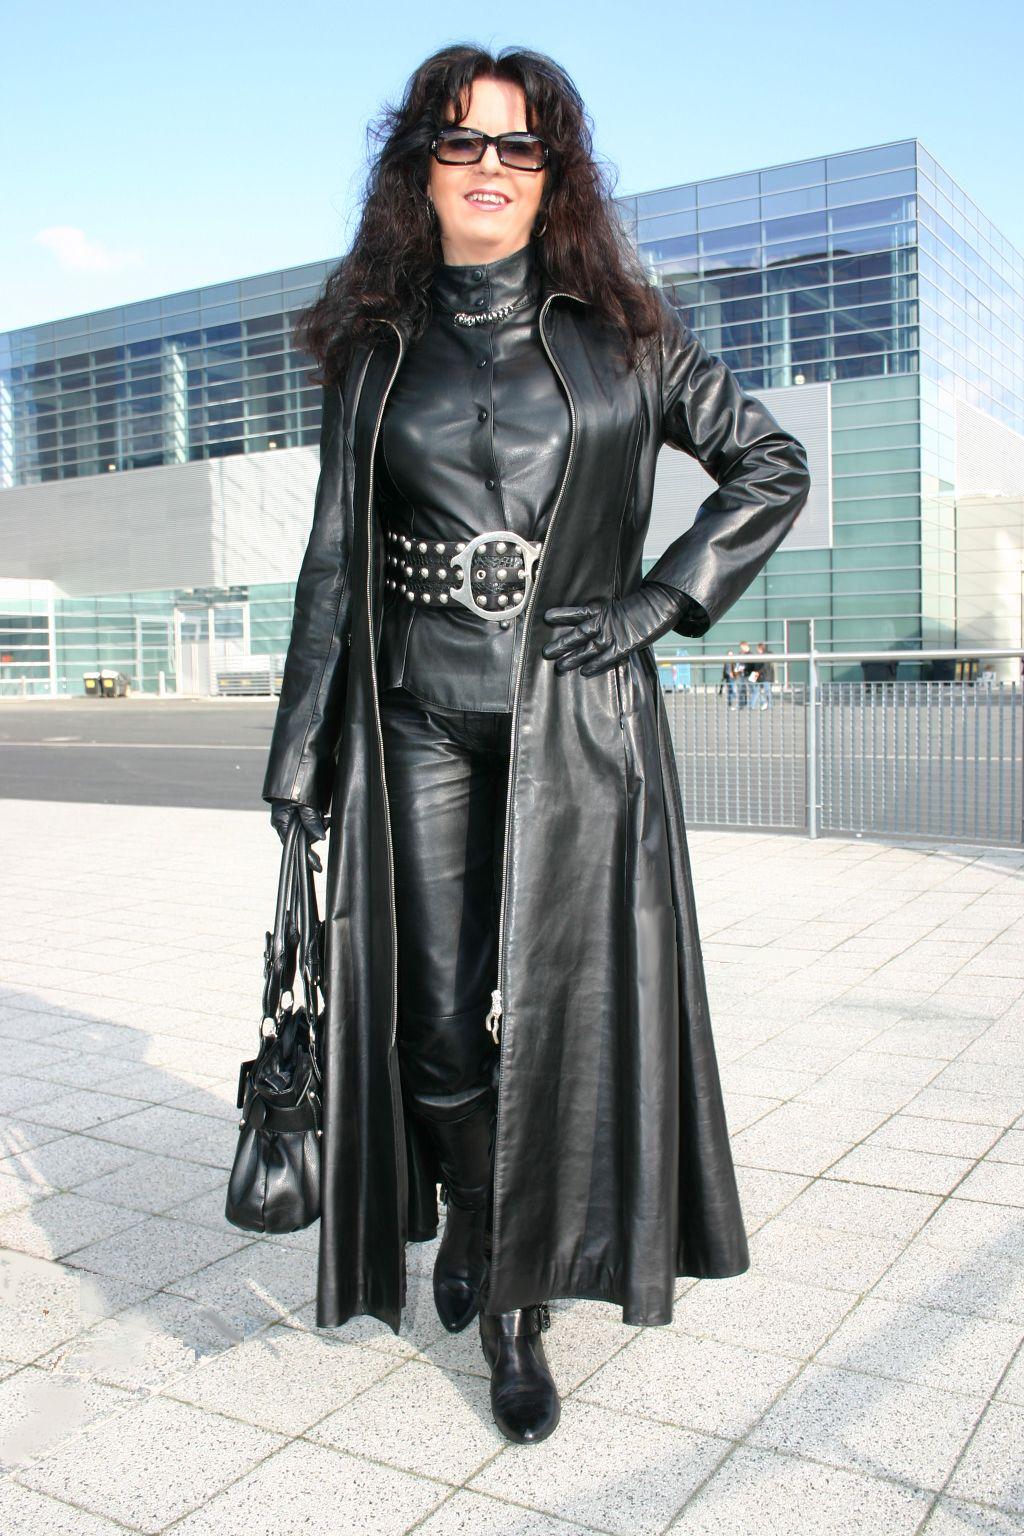 Milf in leather coat